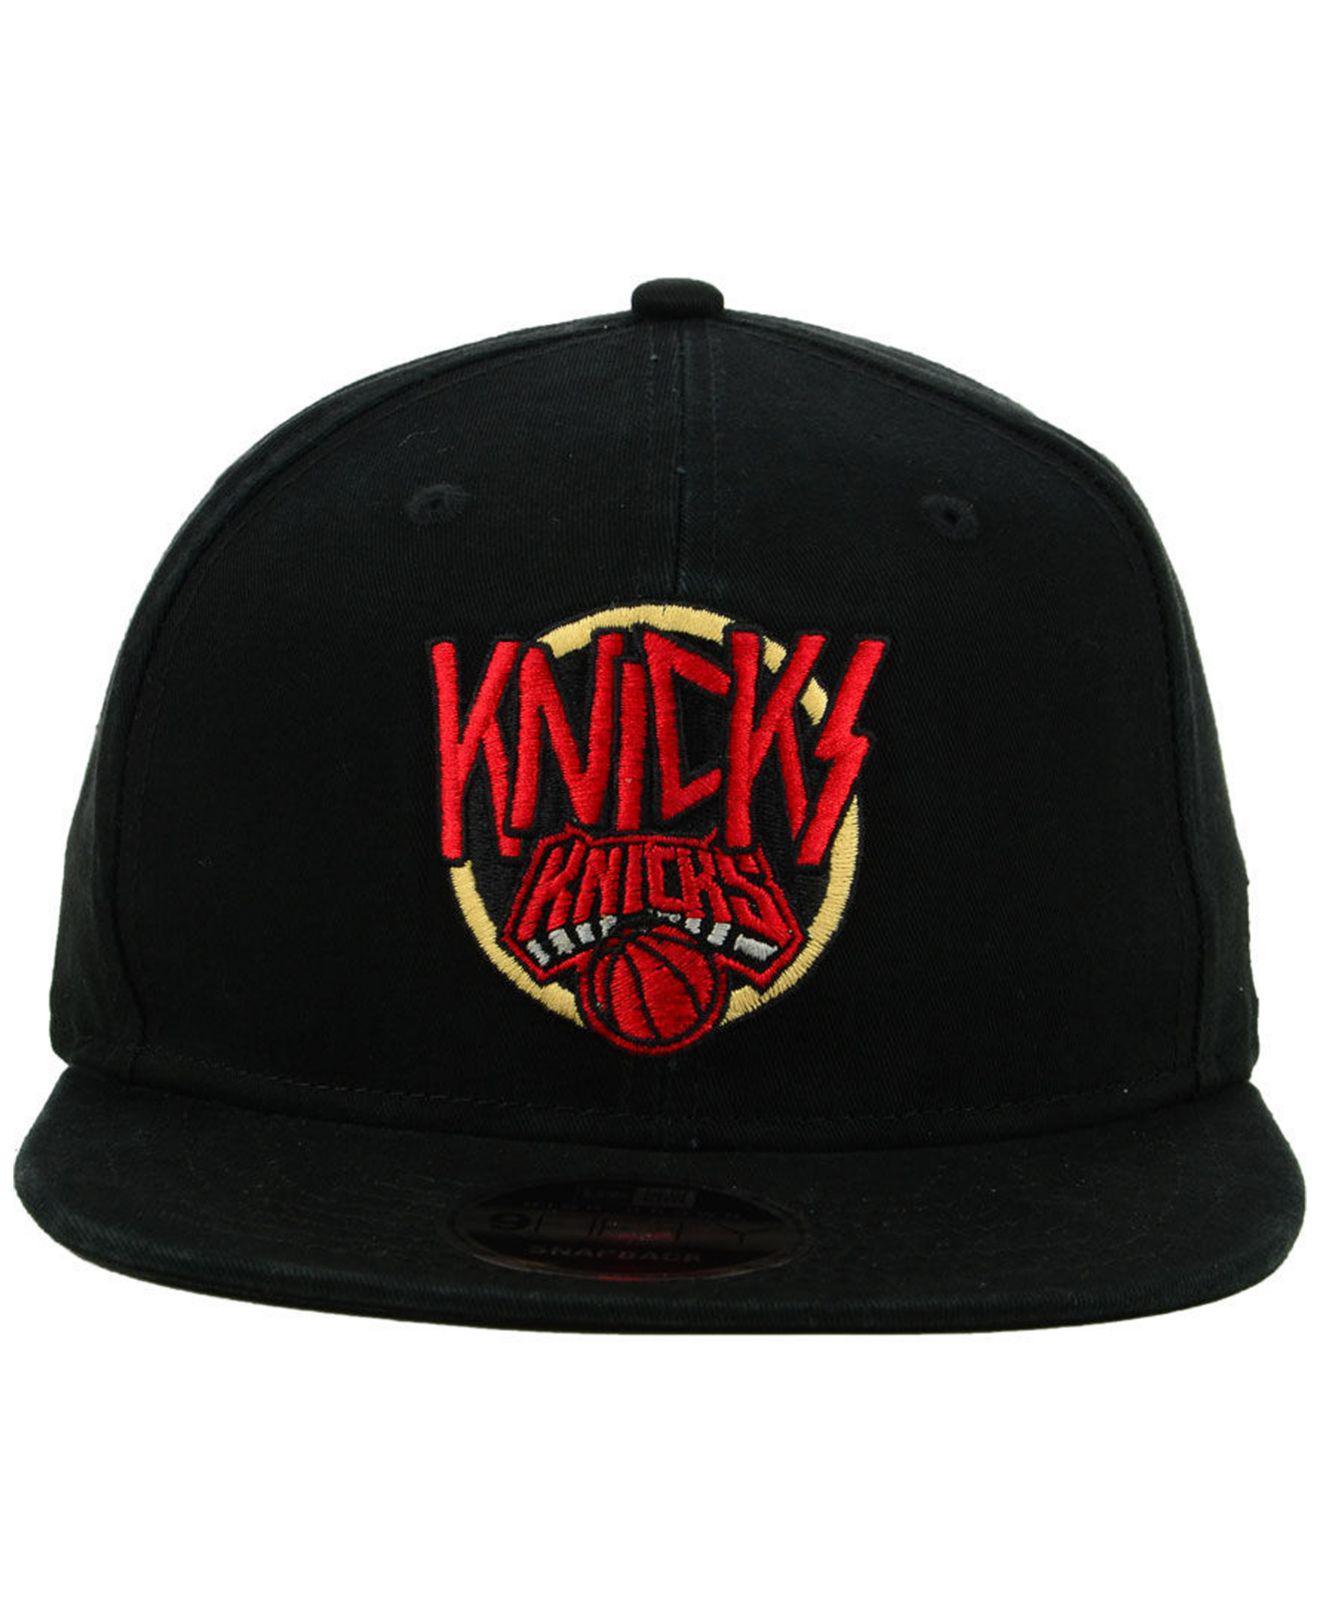 brand new f1709 61f69 KTZ New York Knicks 90s Throwback Tour 9fifty Snapback Cap in Black ...